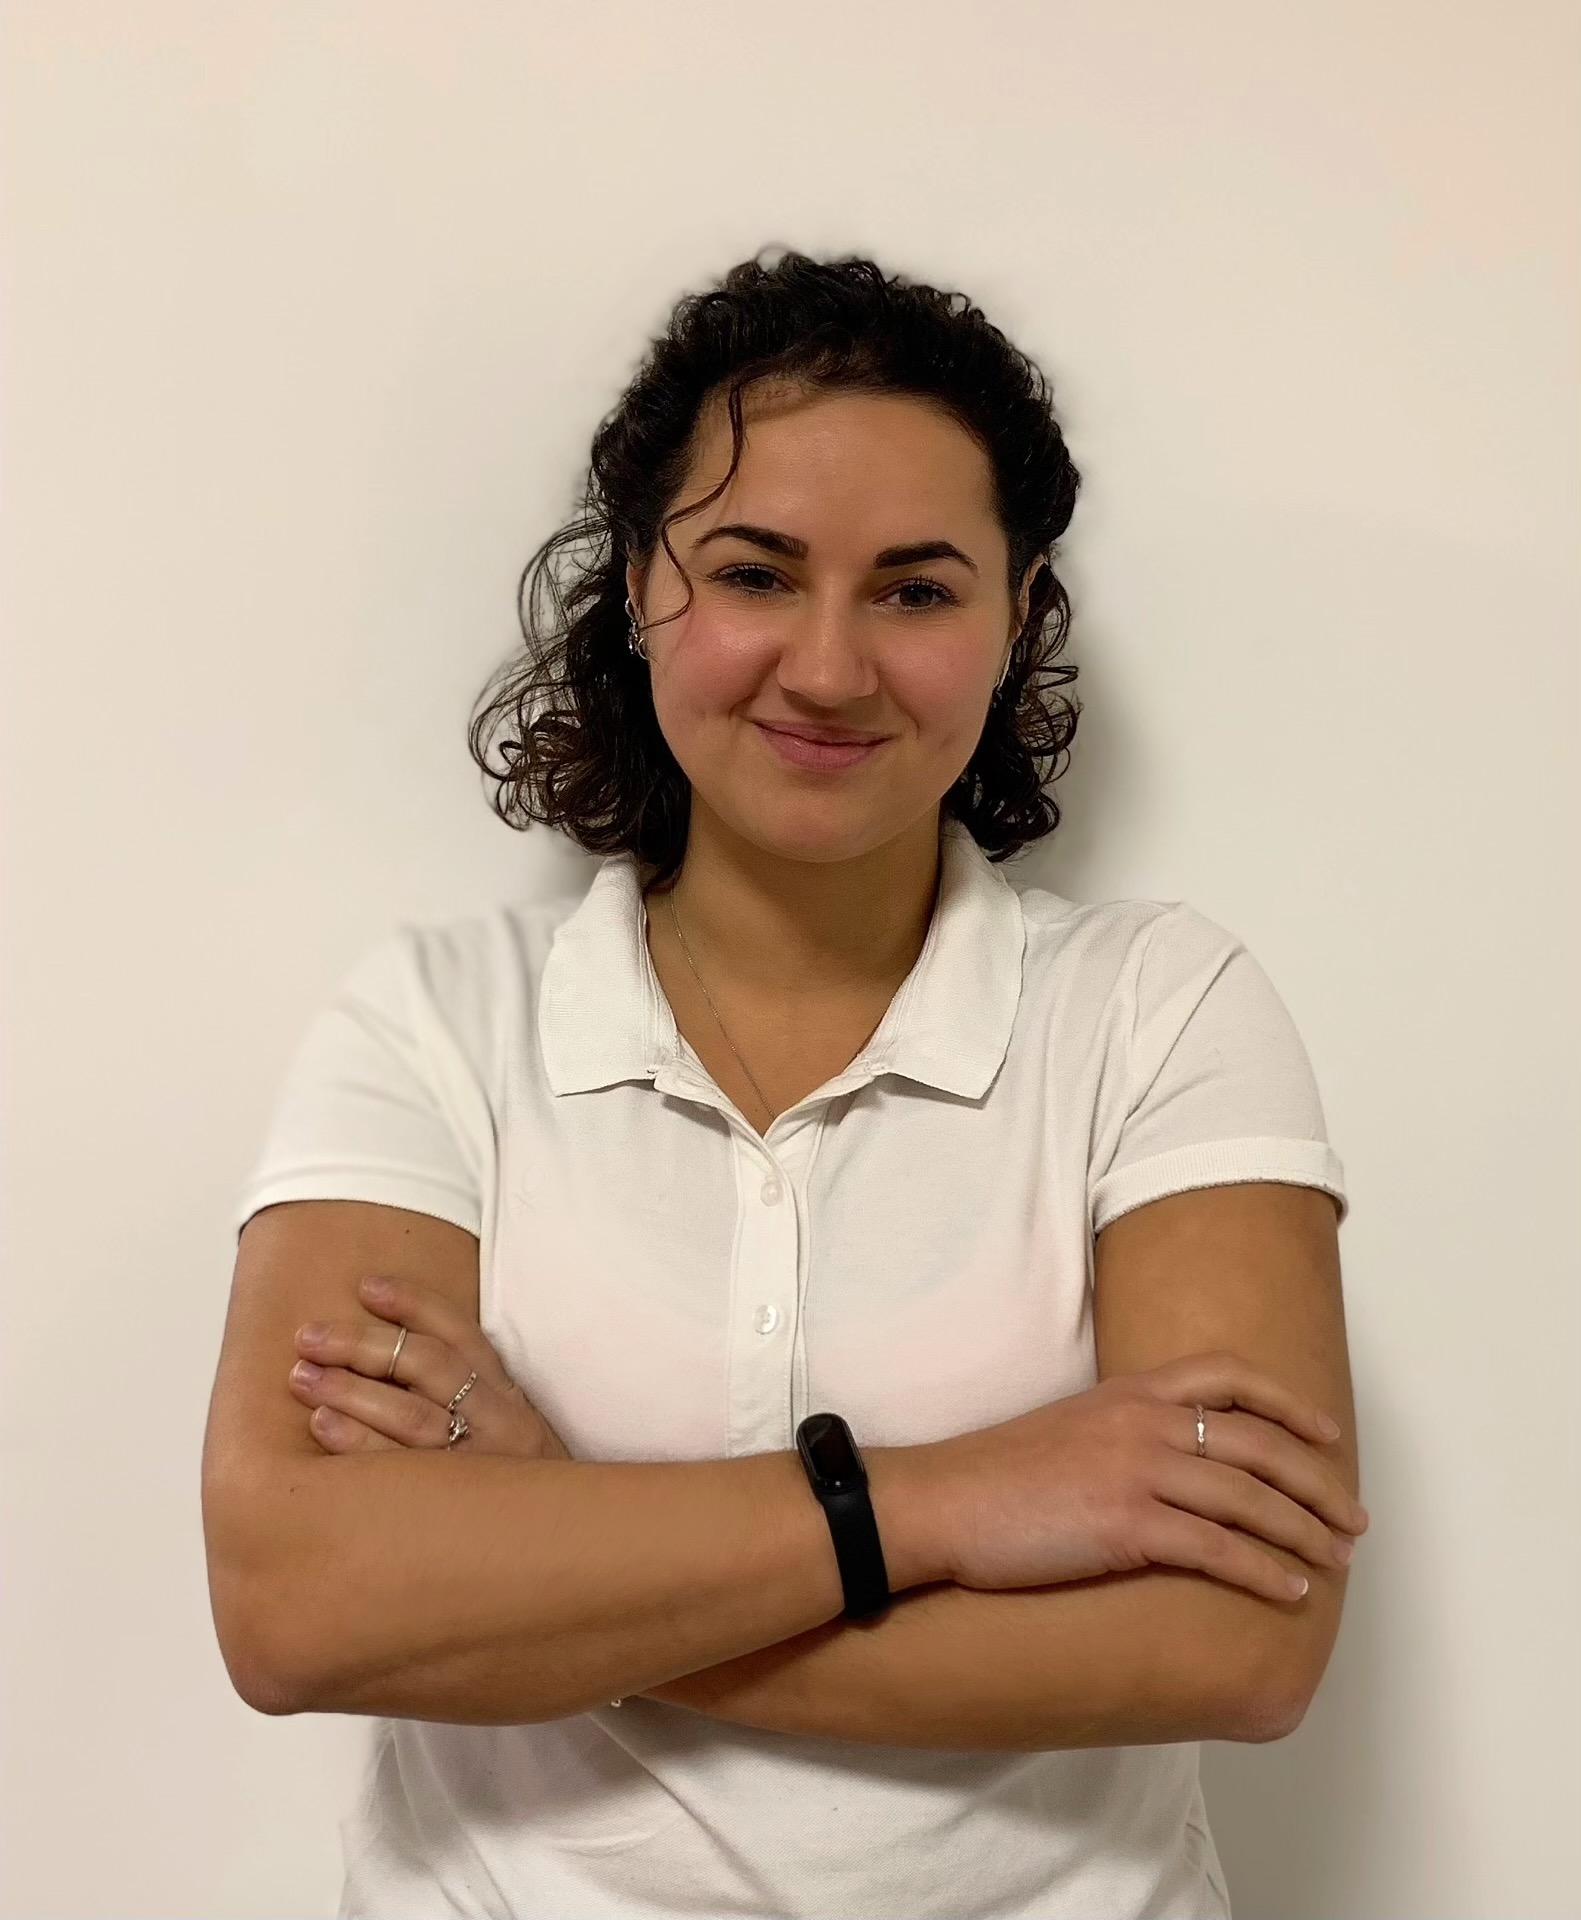 Dott.ssa Matilde Guglielmetti